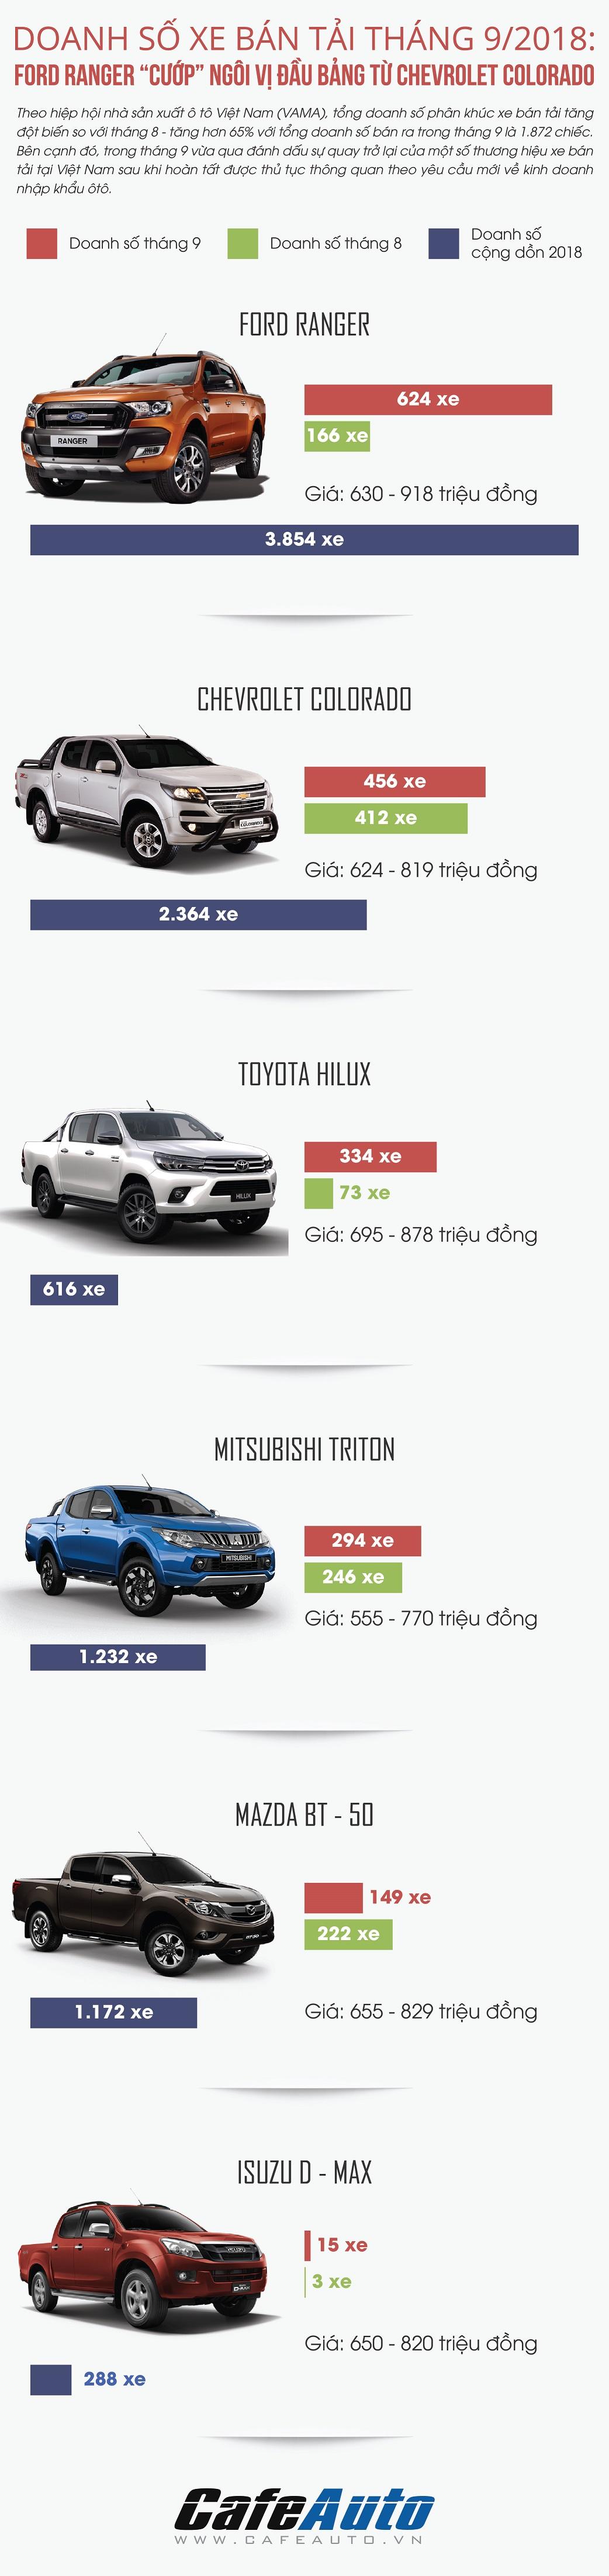 doanh-so-xe-ban-tai-thang-9-2018-ford-ranger-chiem-ngoi-vi-dau-bang-tu-chevrolet-colorado